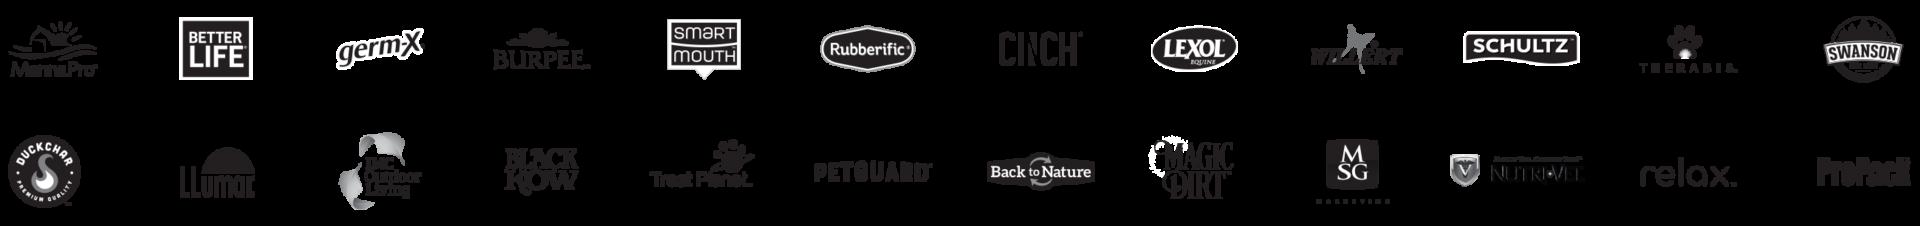 BSD_Client Logos_Small